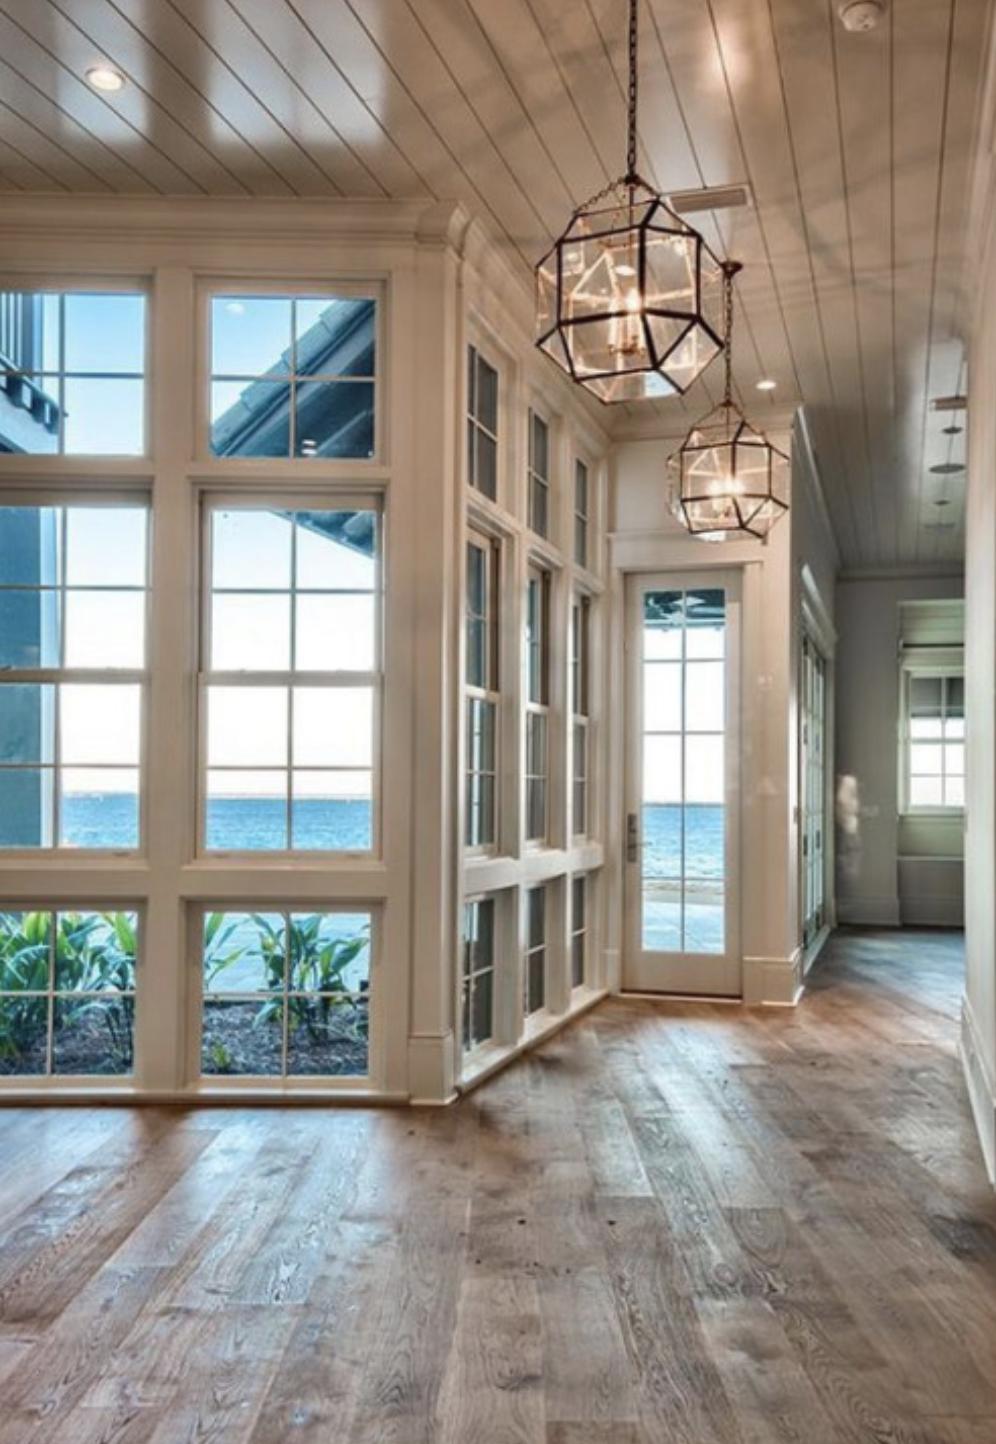 Modern house interior design luxury home designs also floor to ceiling windows   hausmayer prime pinterest rh